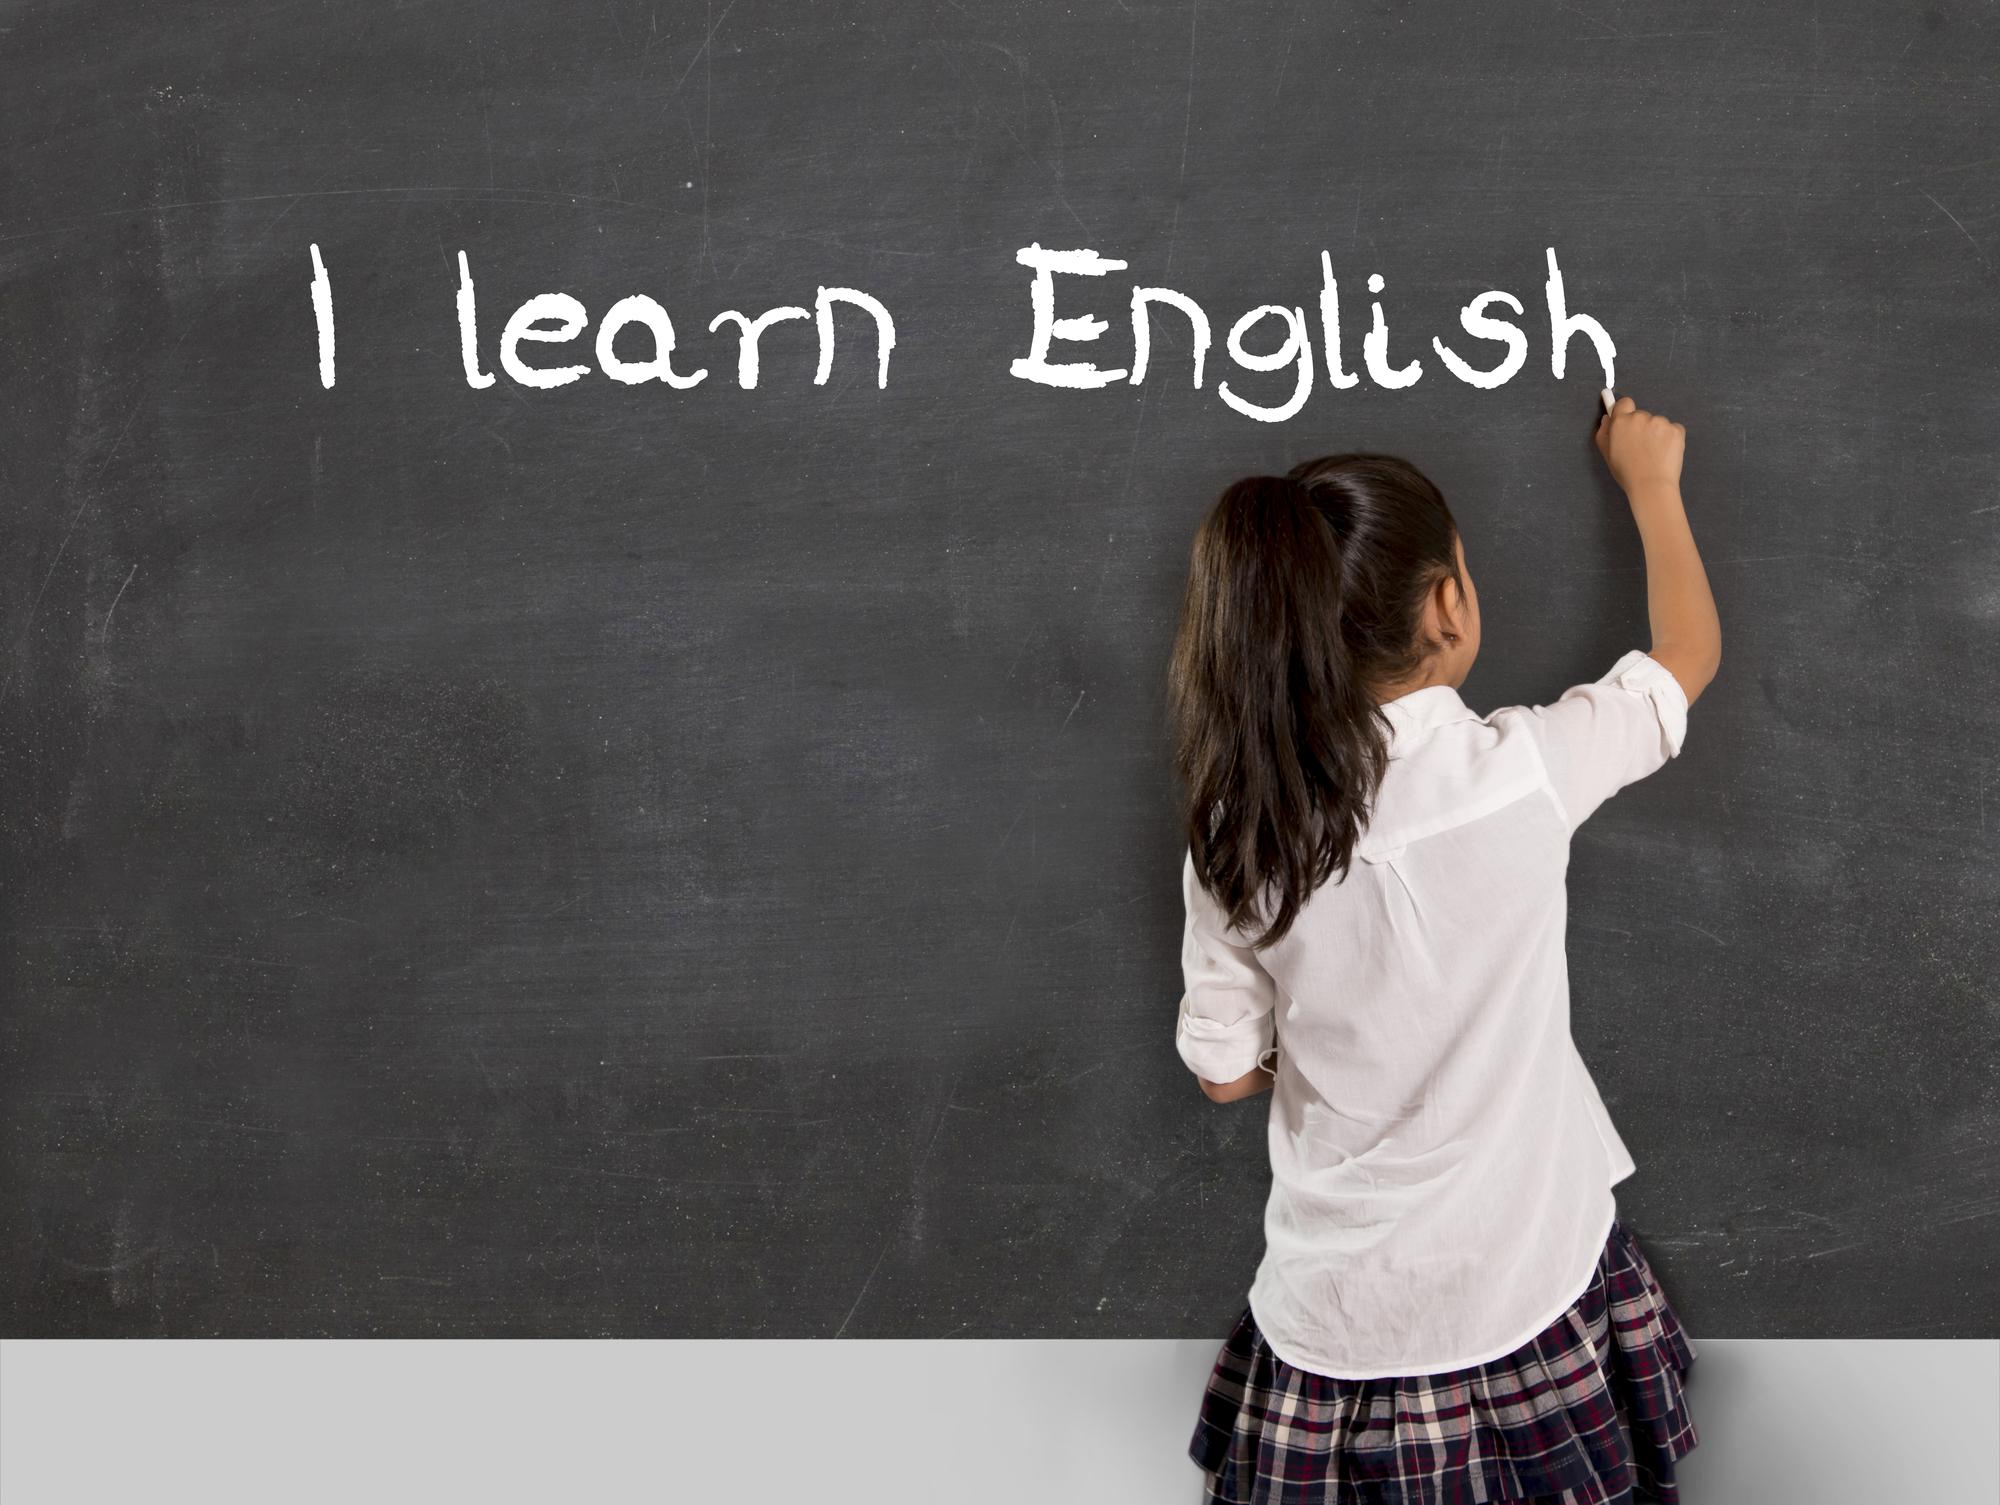 Motivos de peso para aprender inglés en Houston